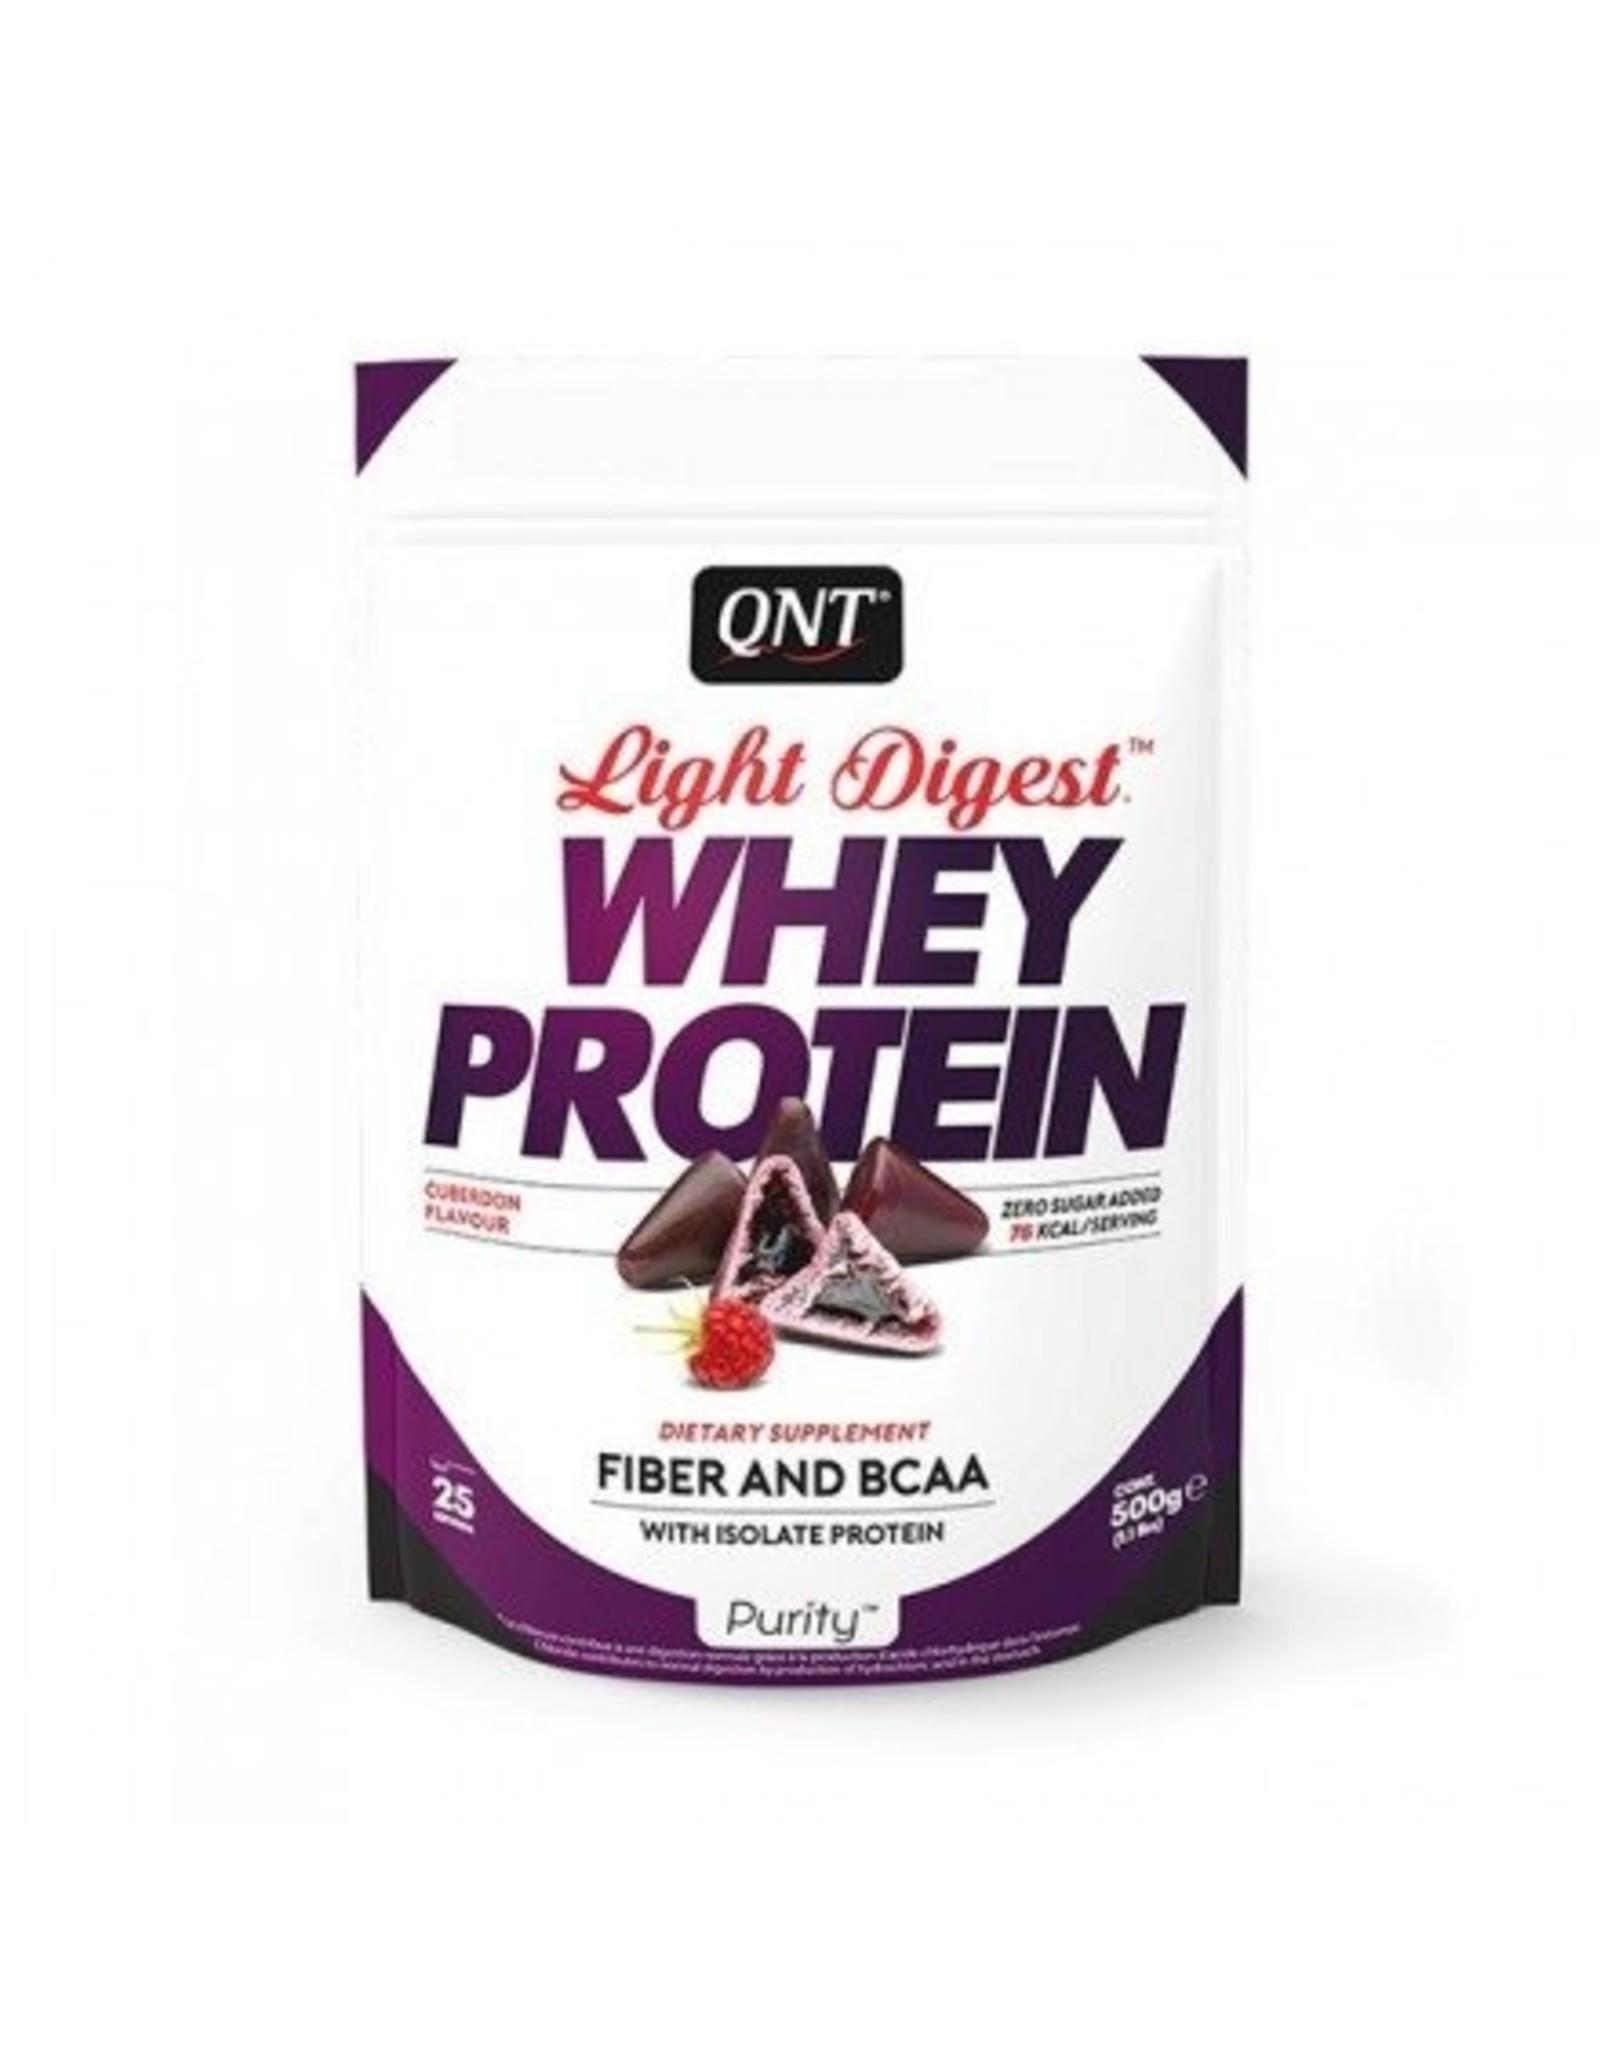 QNT Whey Protein Light digest